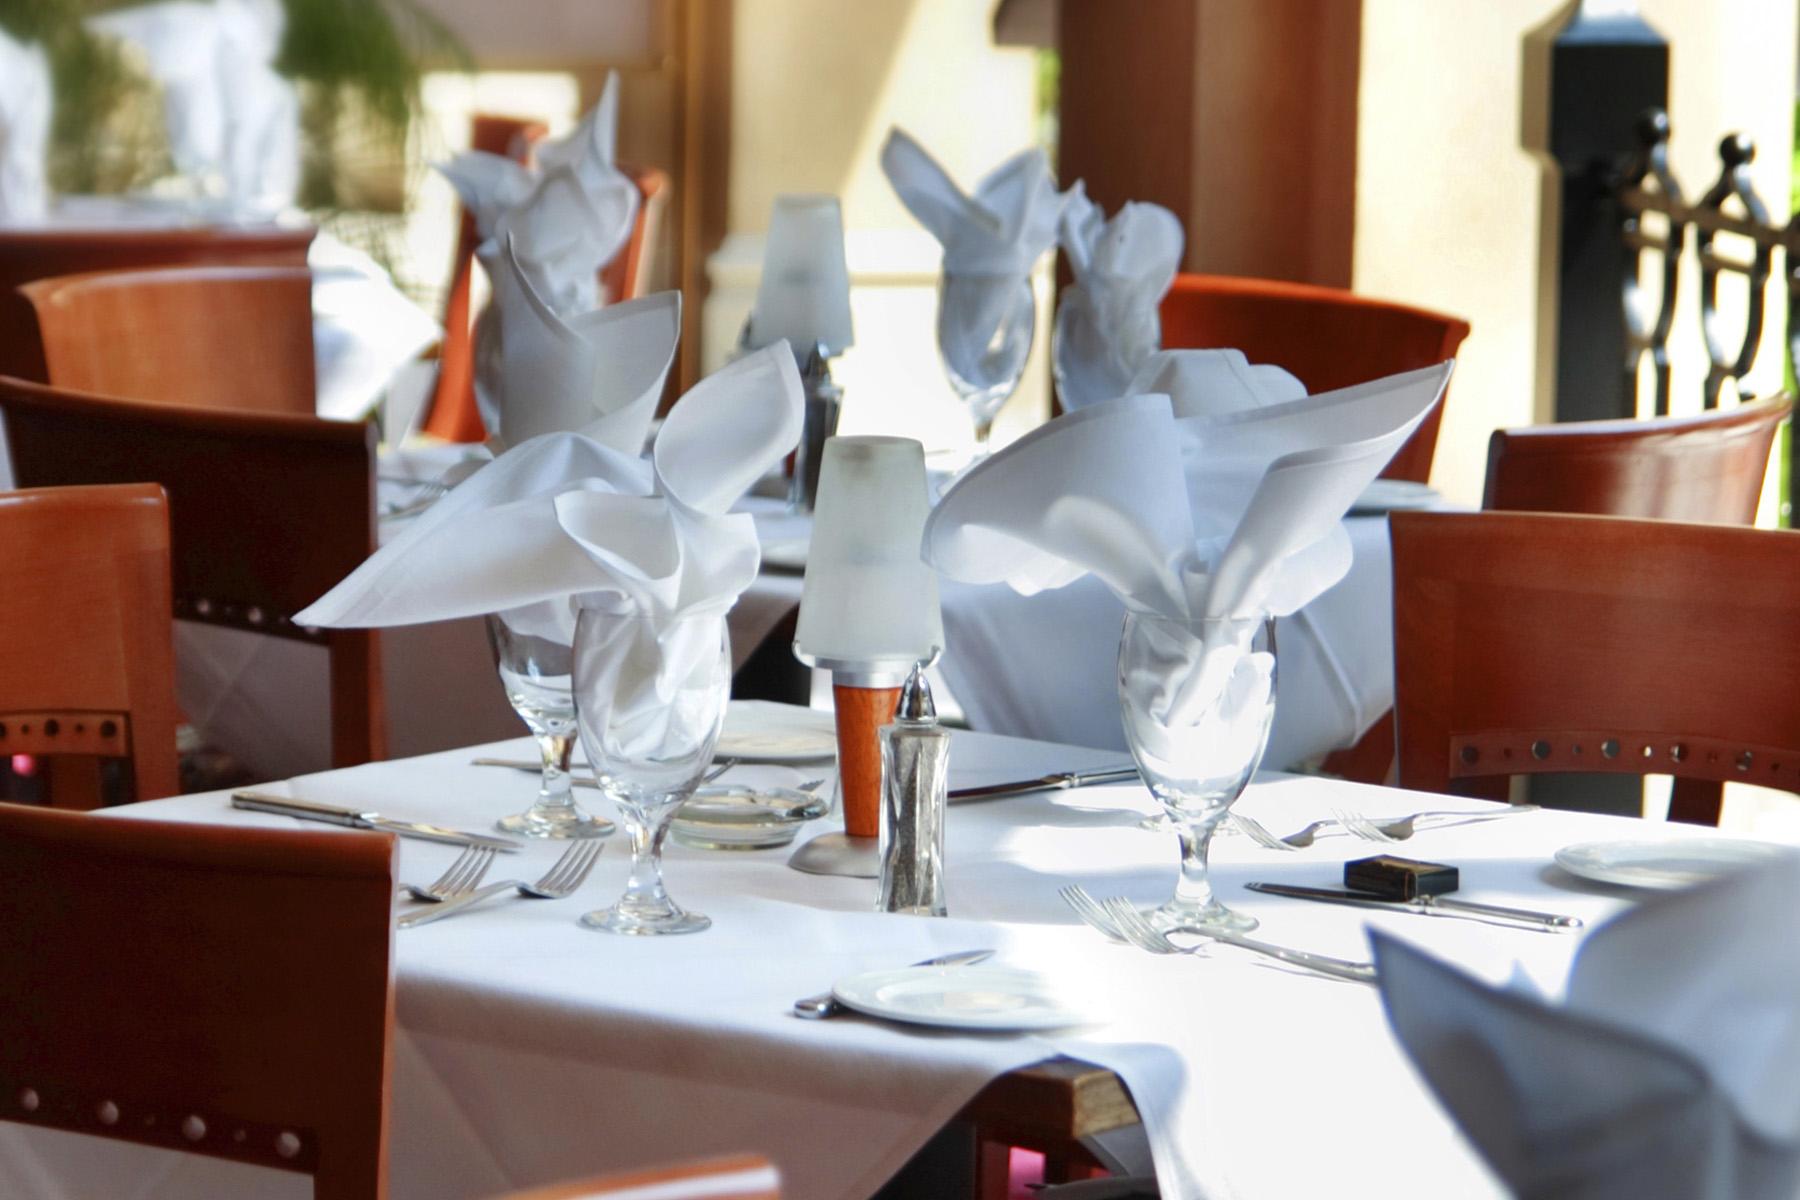 White Tablecloth Restaurant - Tablecloths